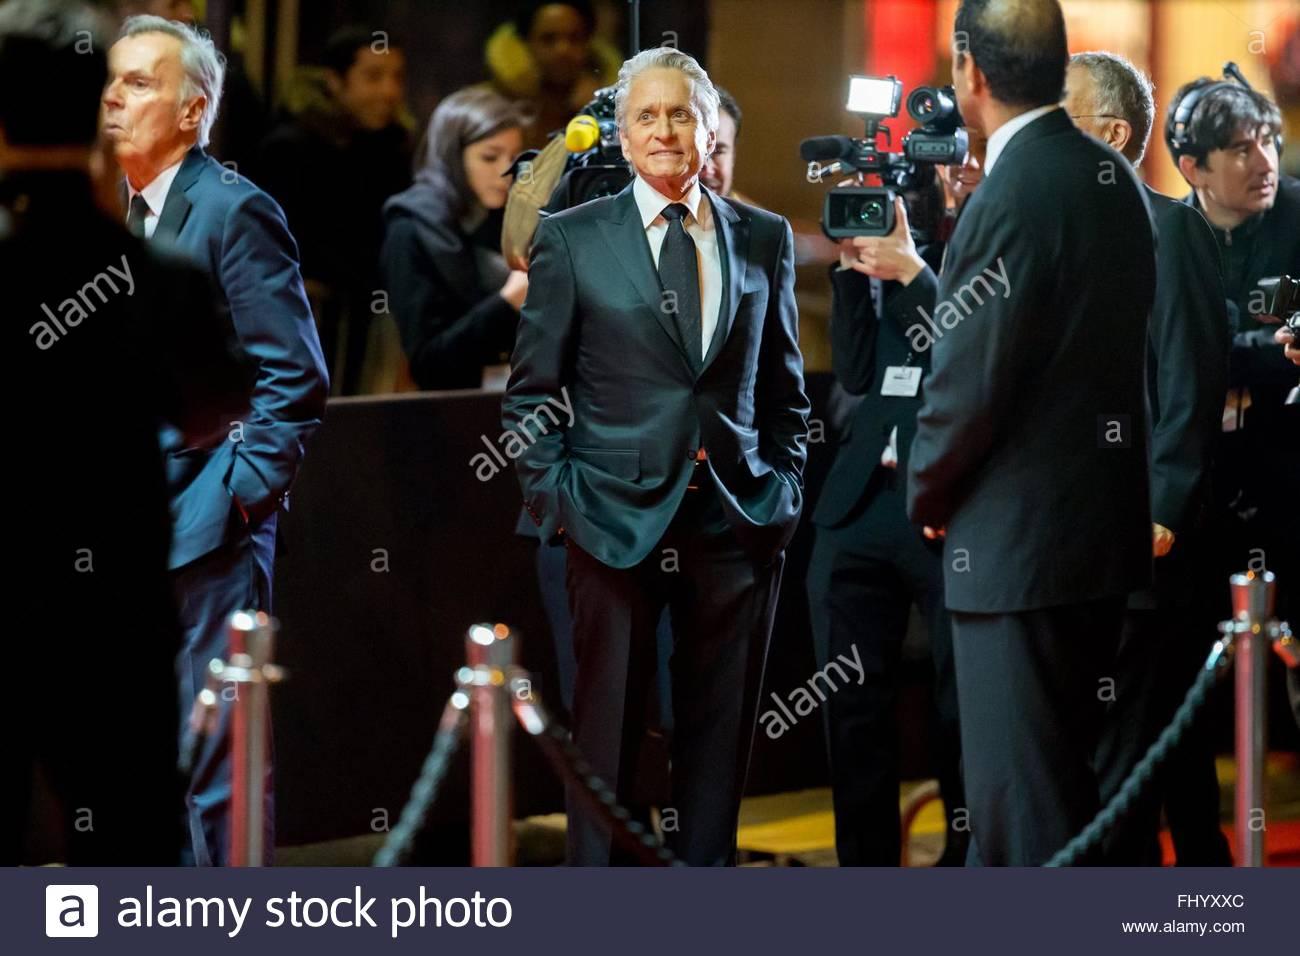 Paris, France. February 26th, 2016. FRANCE, Paris: US actor Michael Douglas walks on the red carpet of the 41st - Stock Image